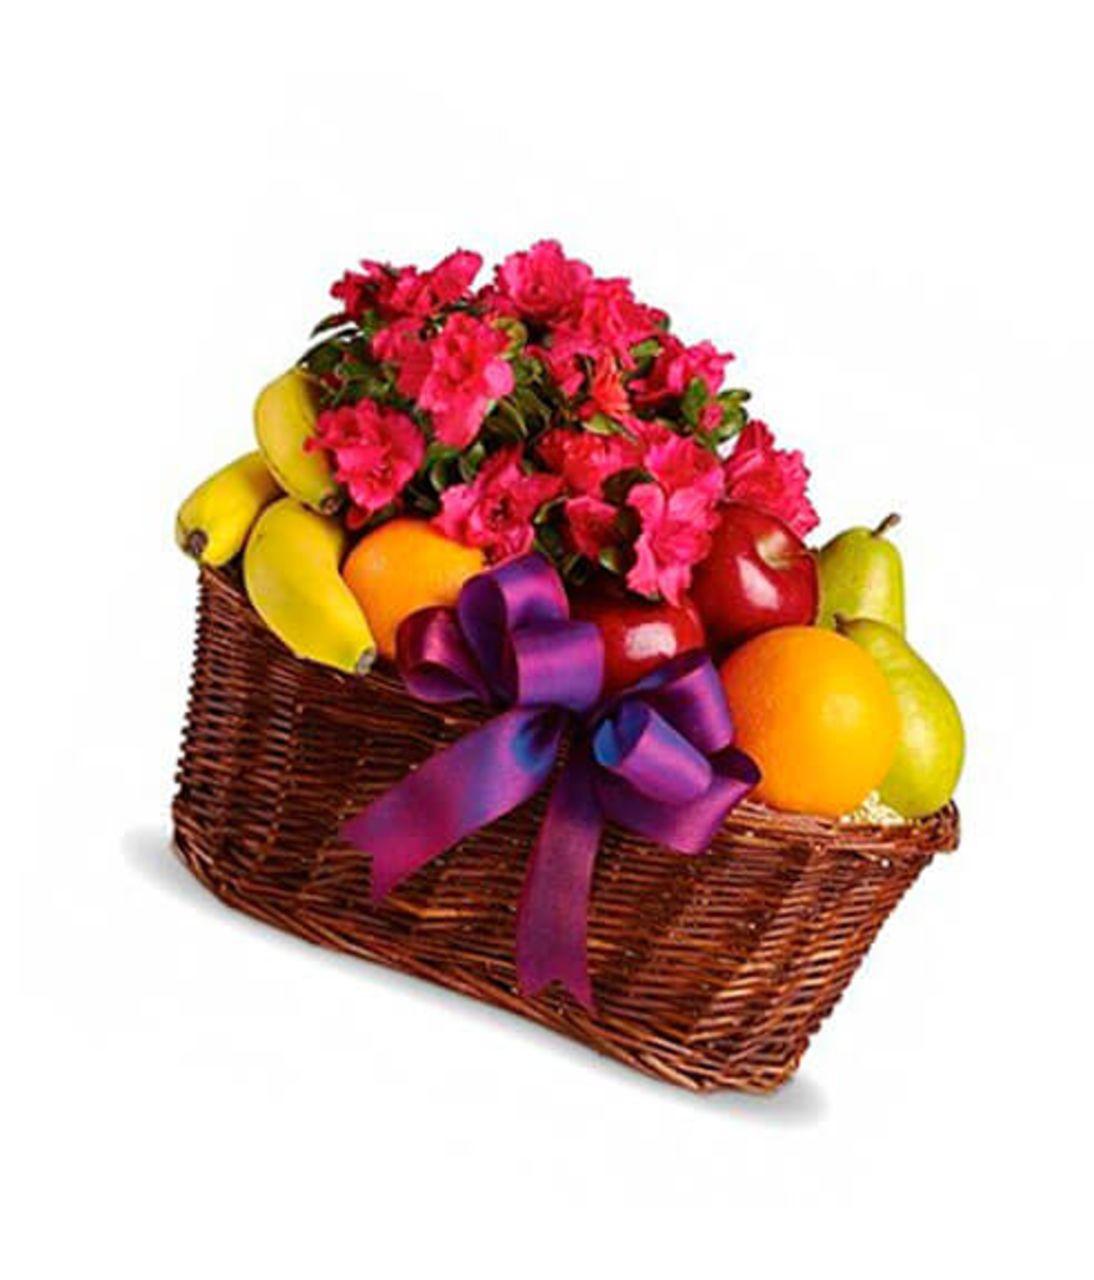 Фруктовий кошик №2. Superflowers.com.ua